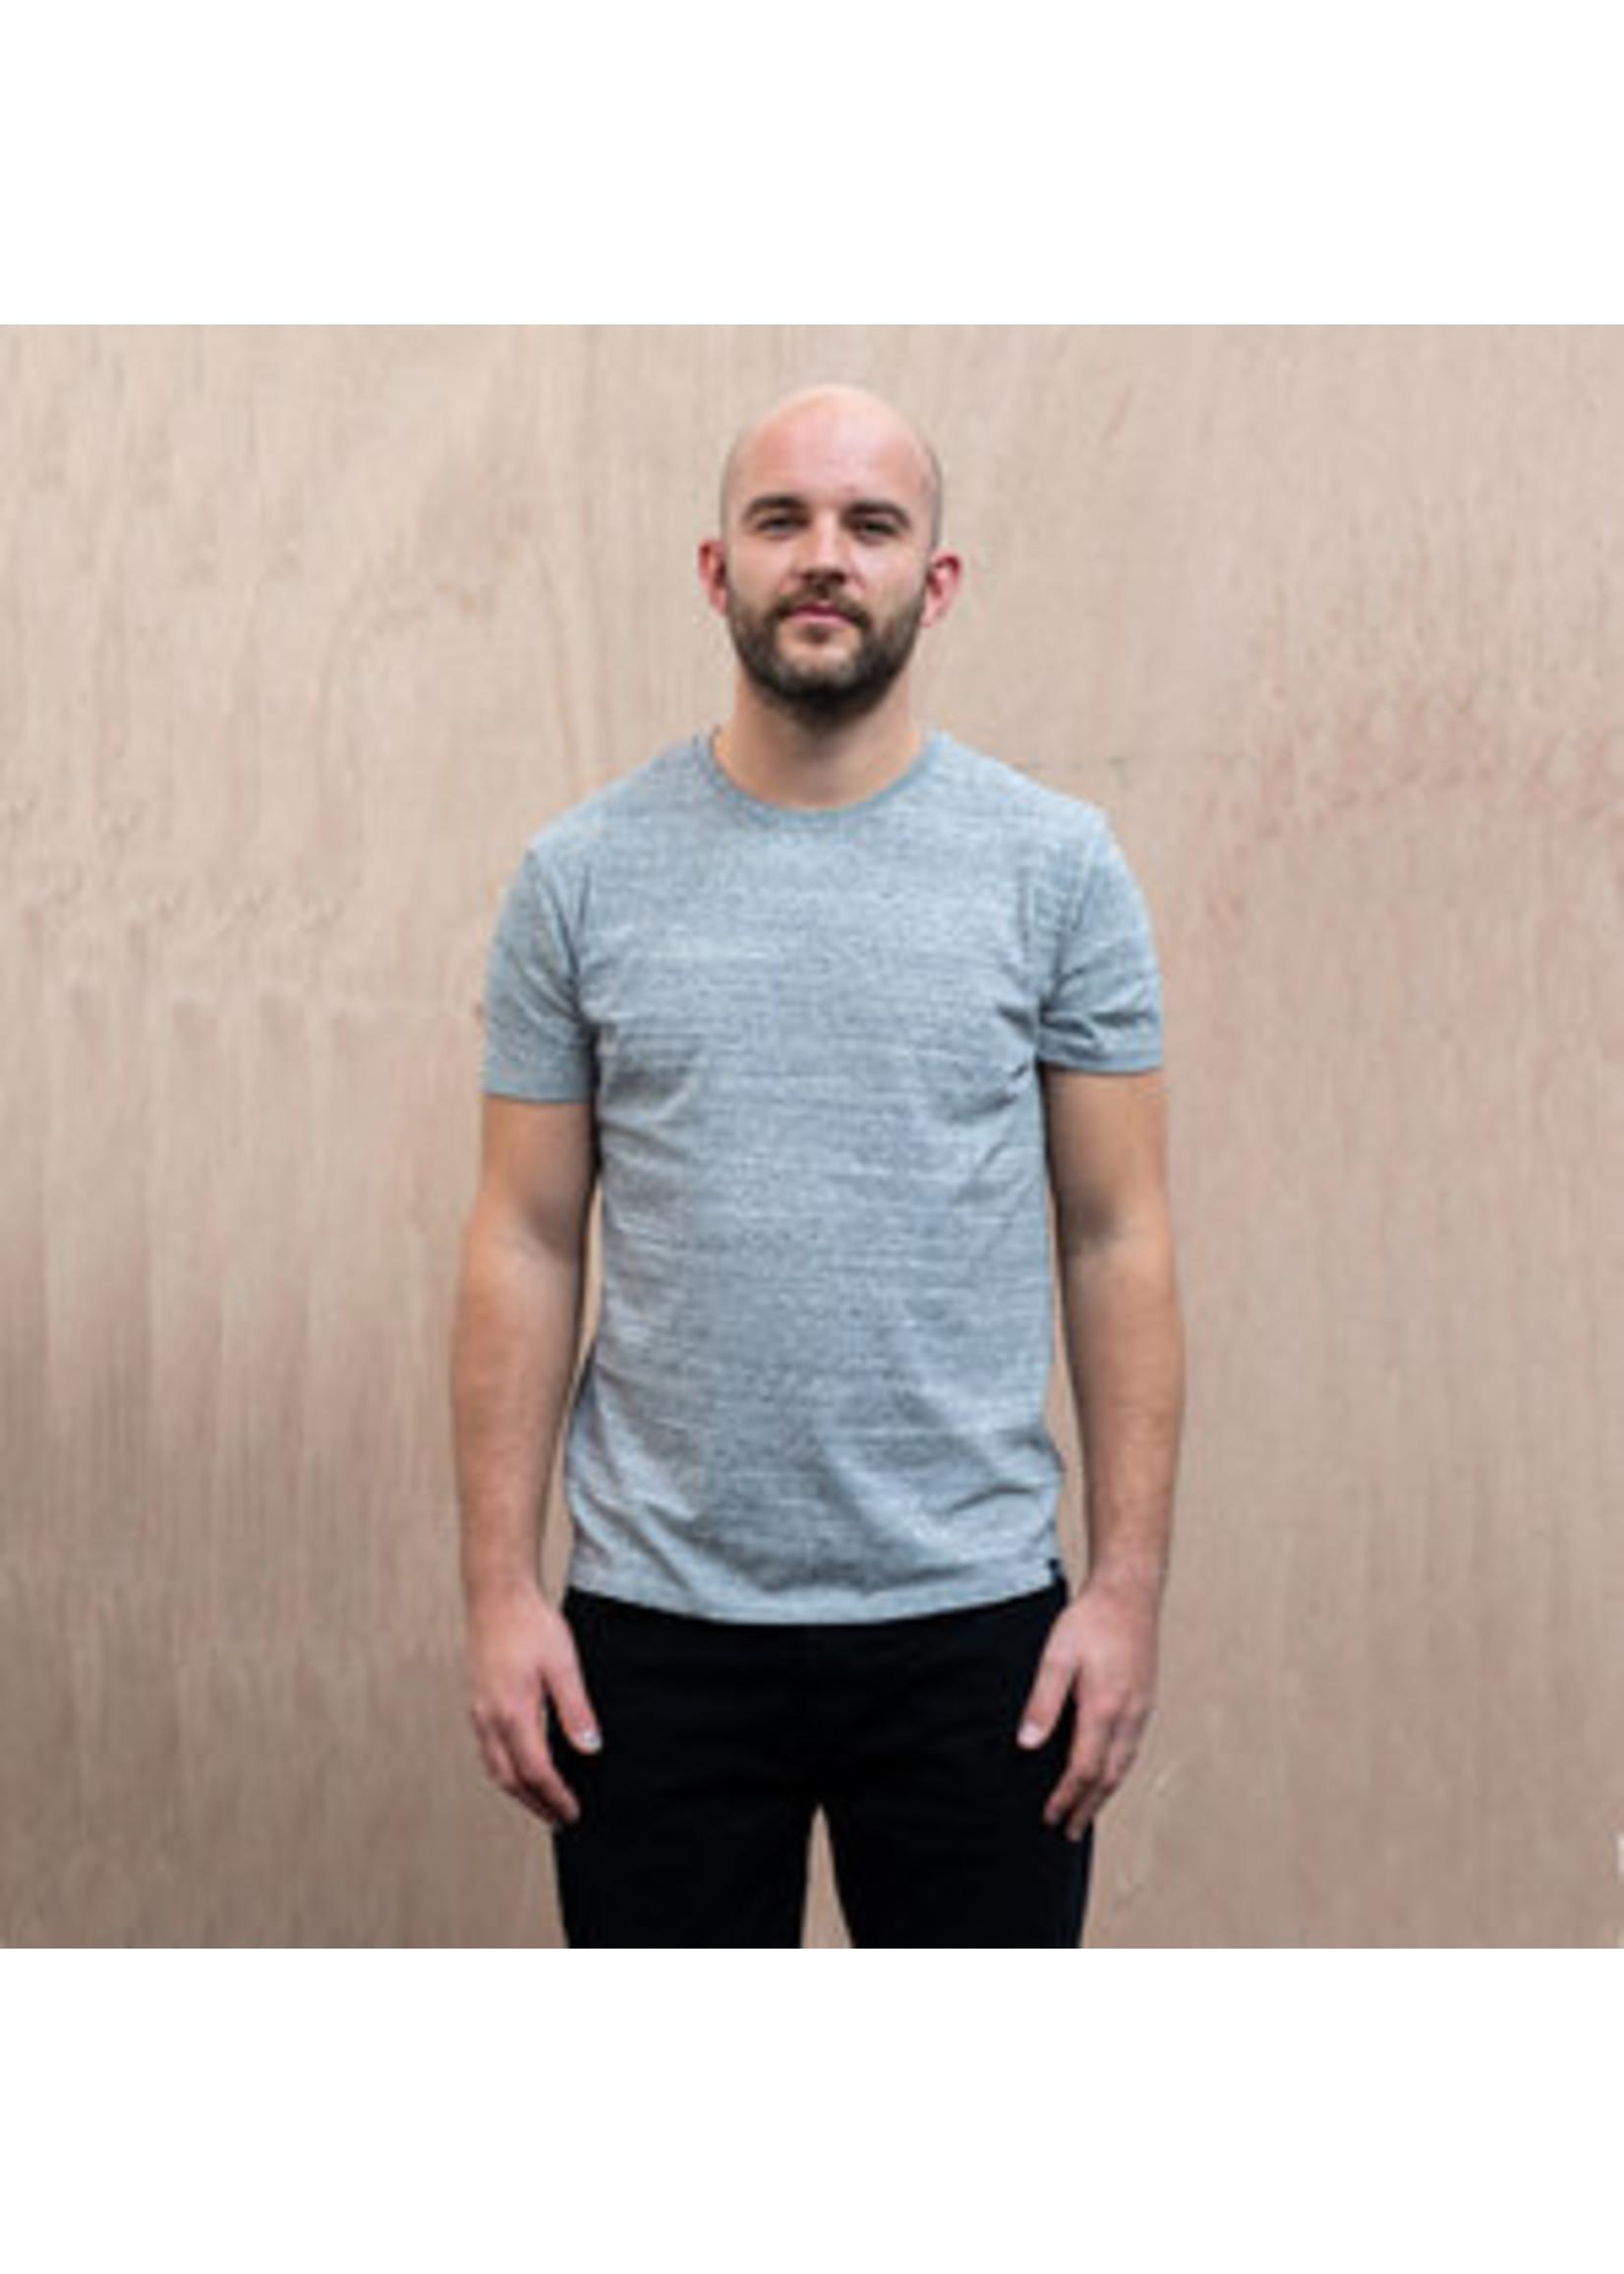 The Level Collective The Level Collective Bamford T-shirt Grey marl